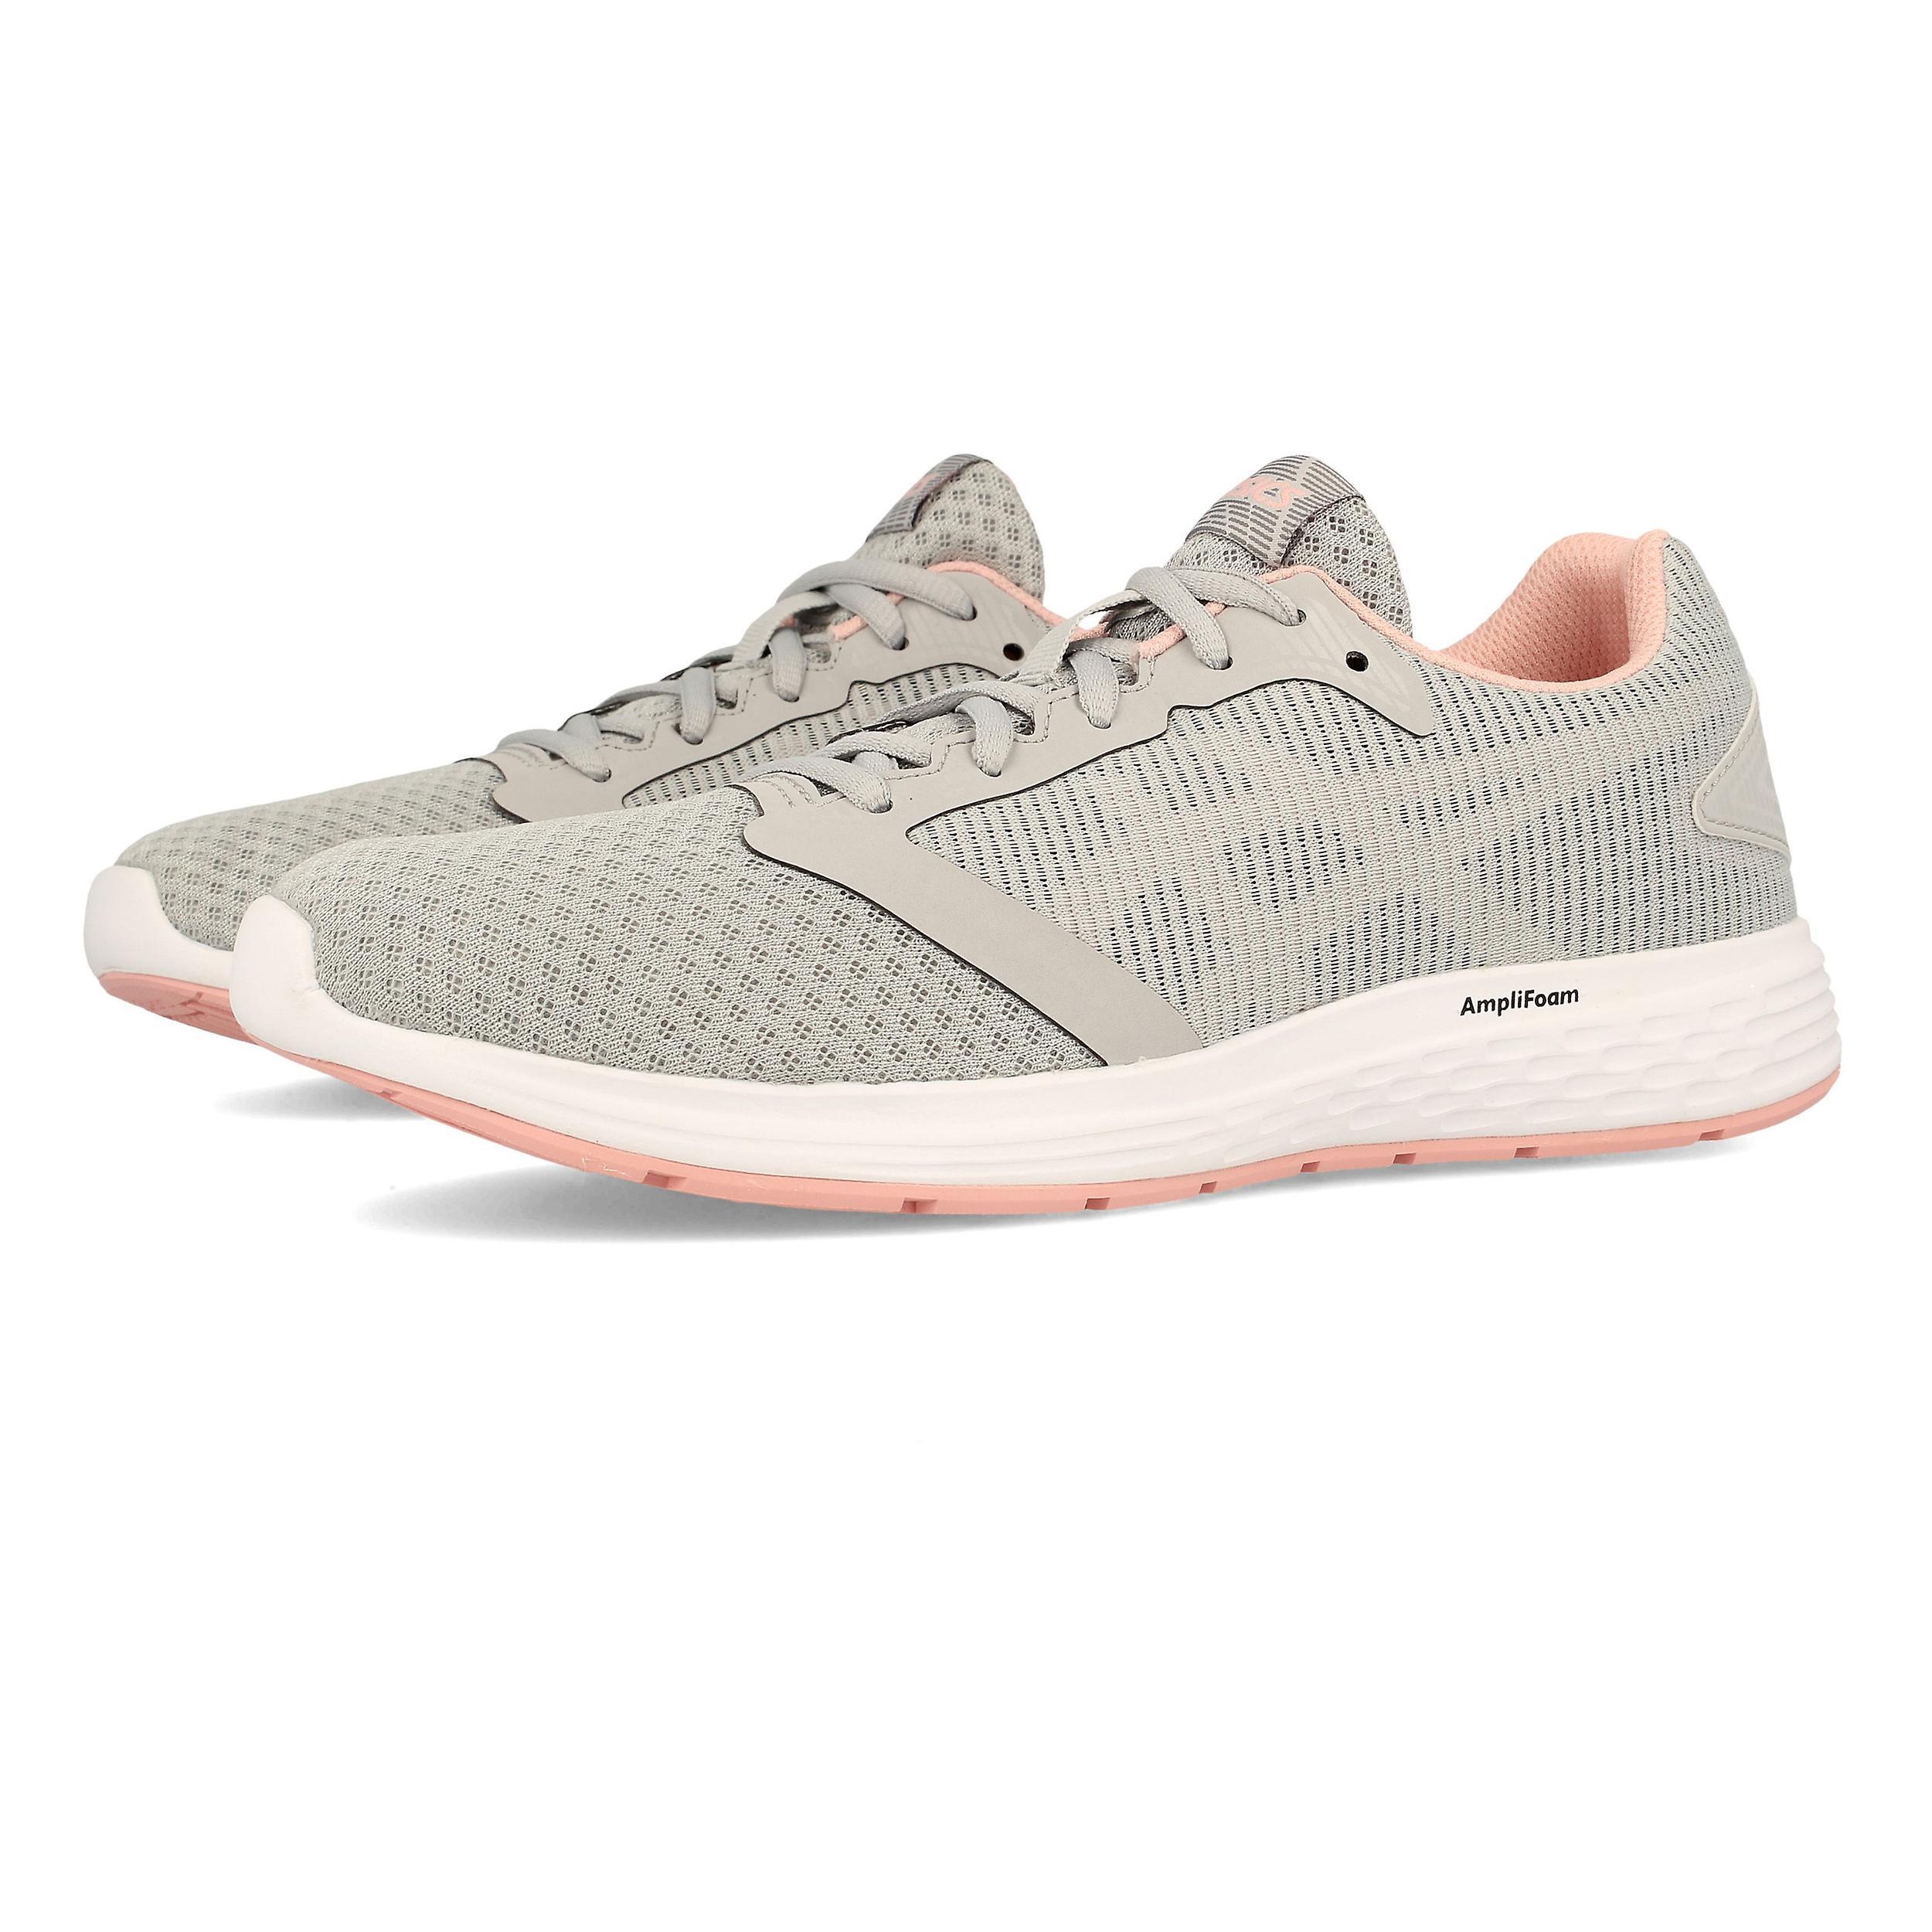 buy popular 047df 98359 Asics Patriot 10 Women s Running Shoes